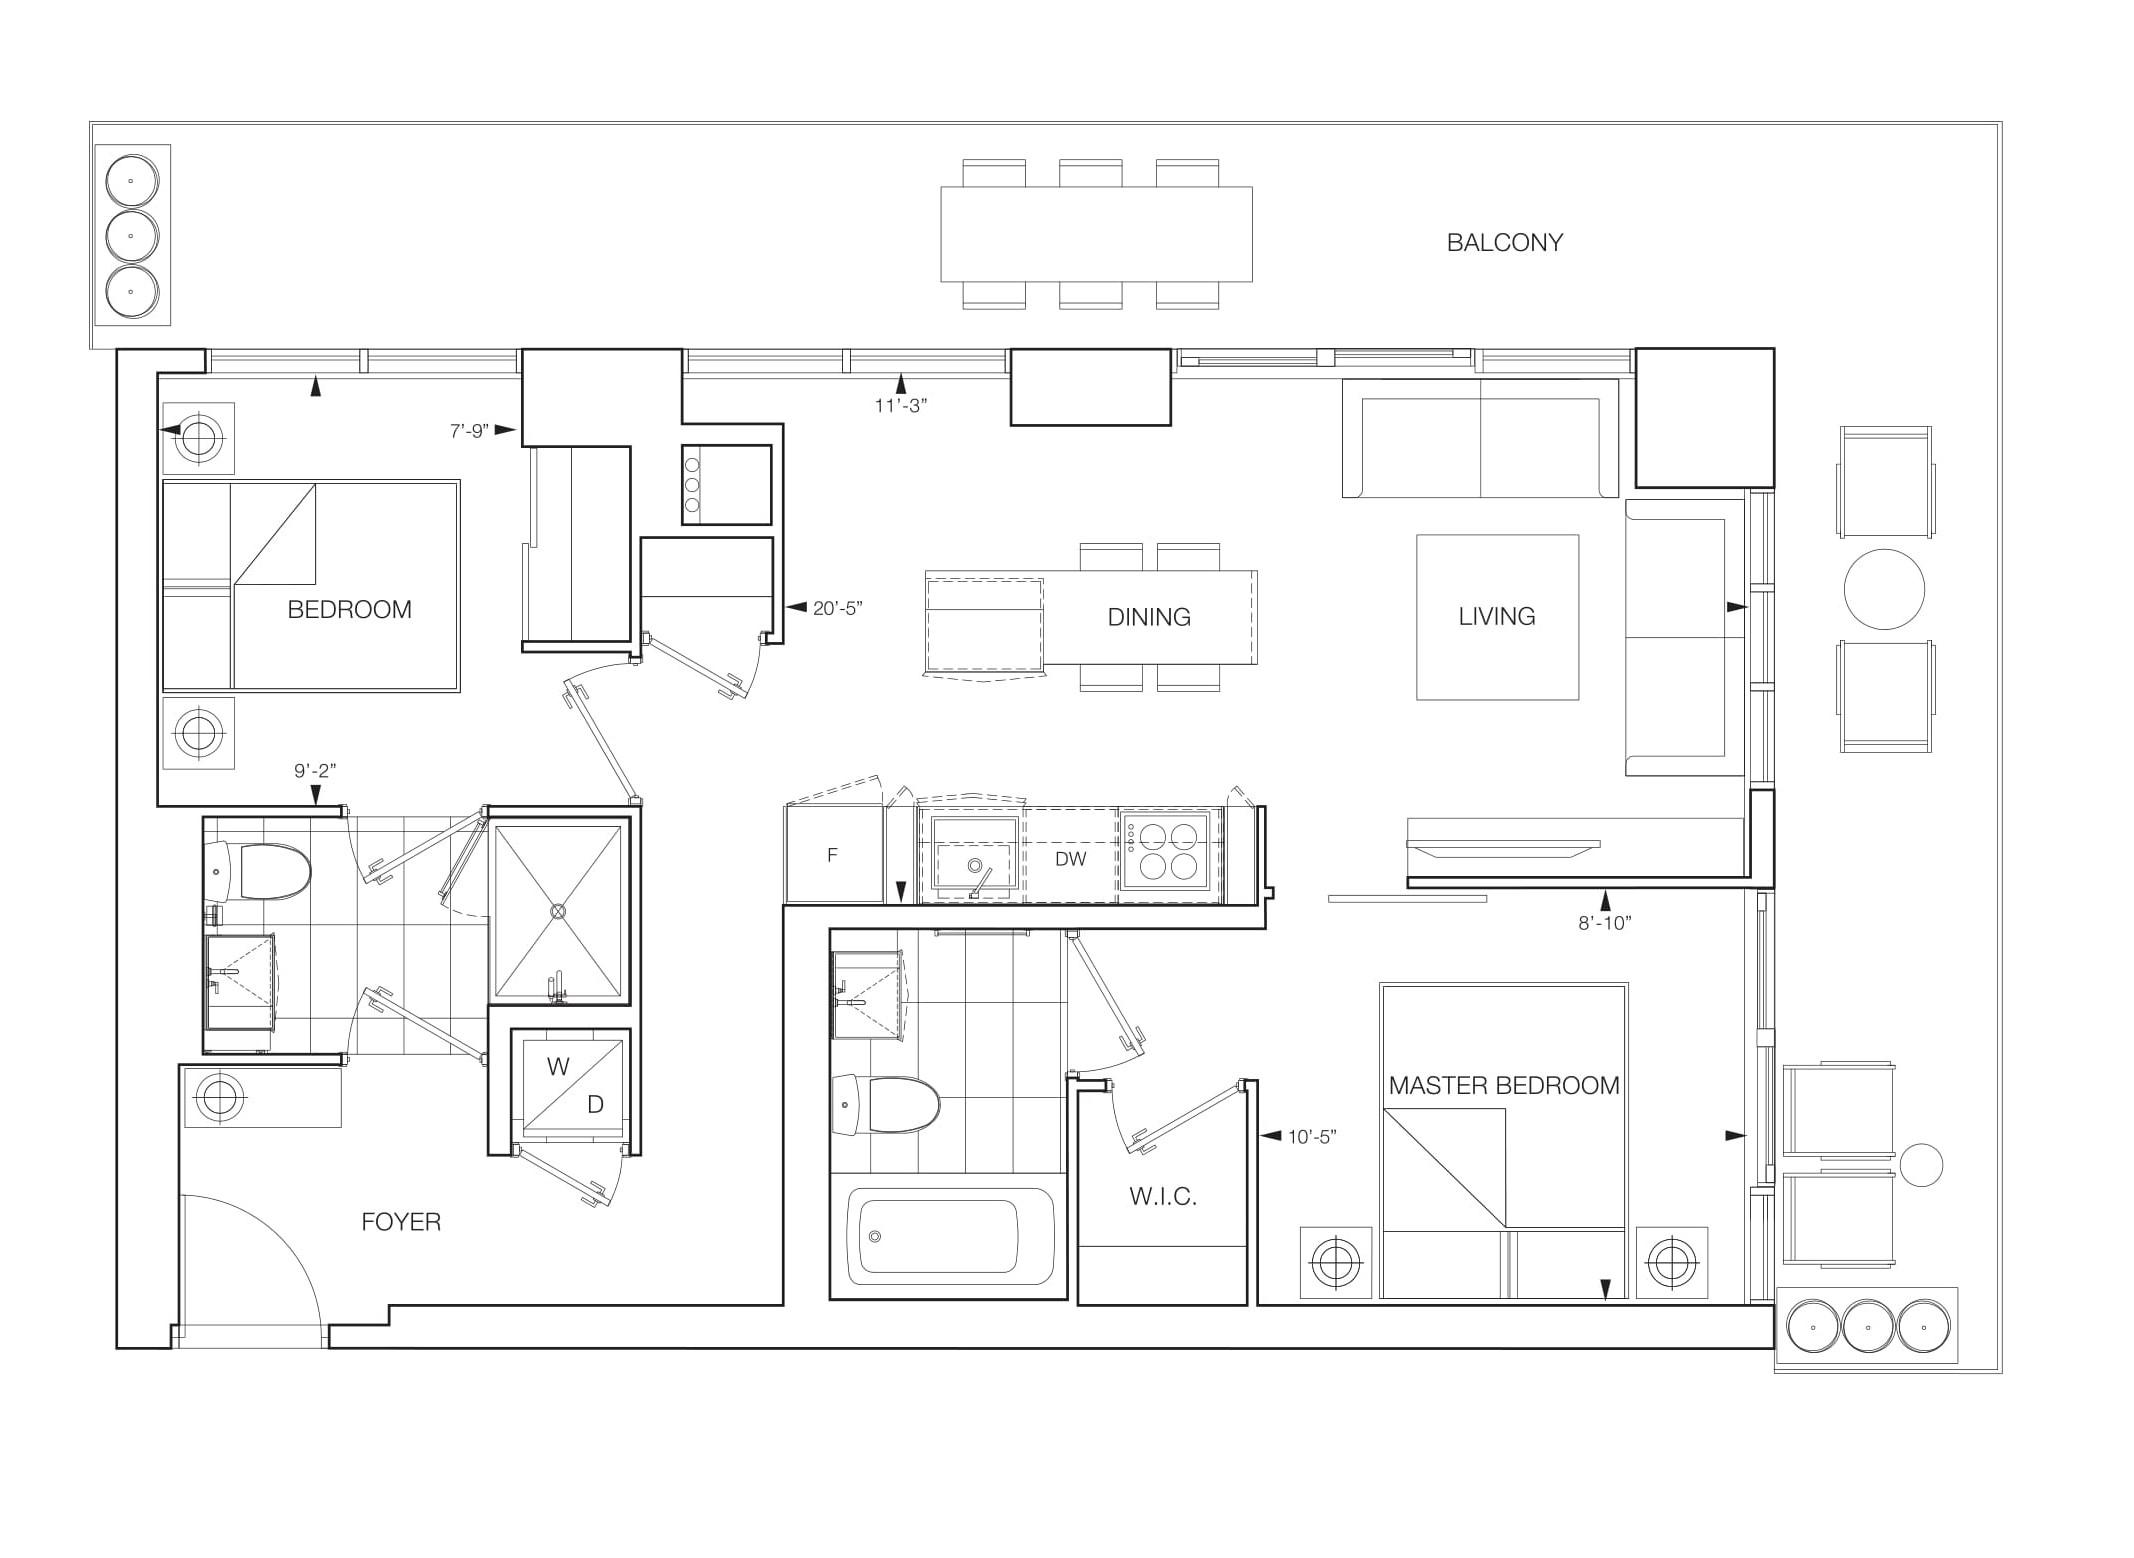 Viz Floorplans